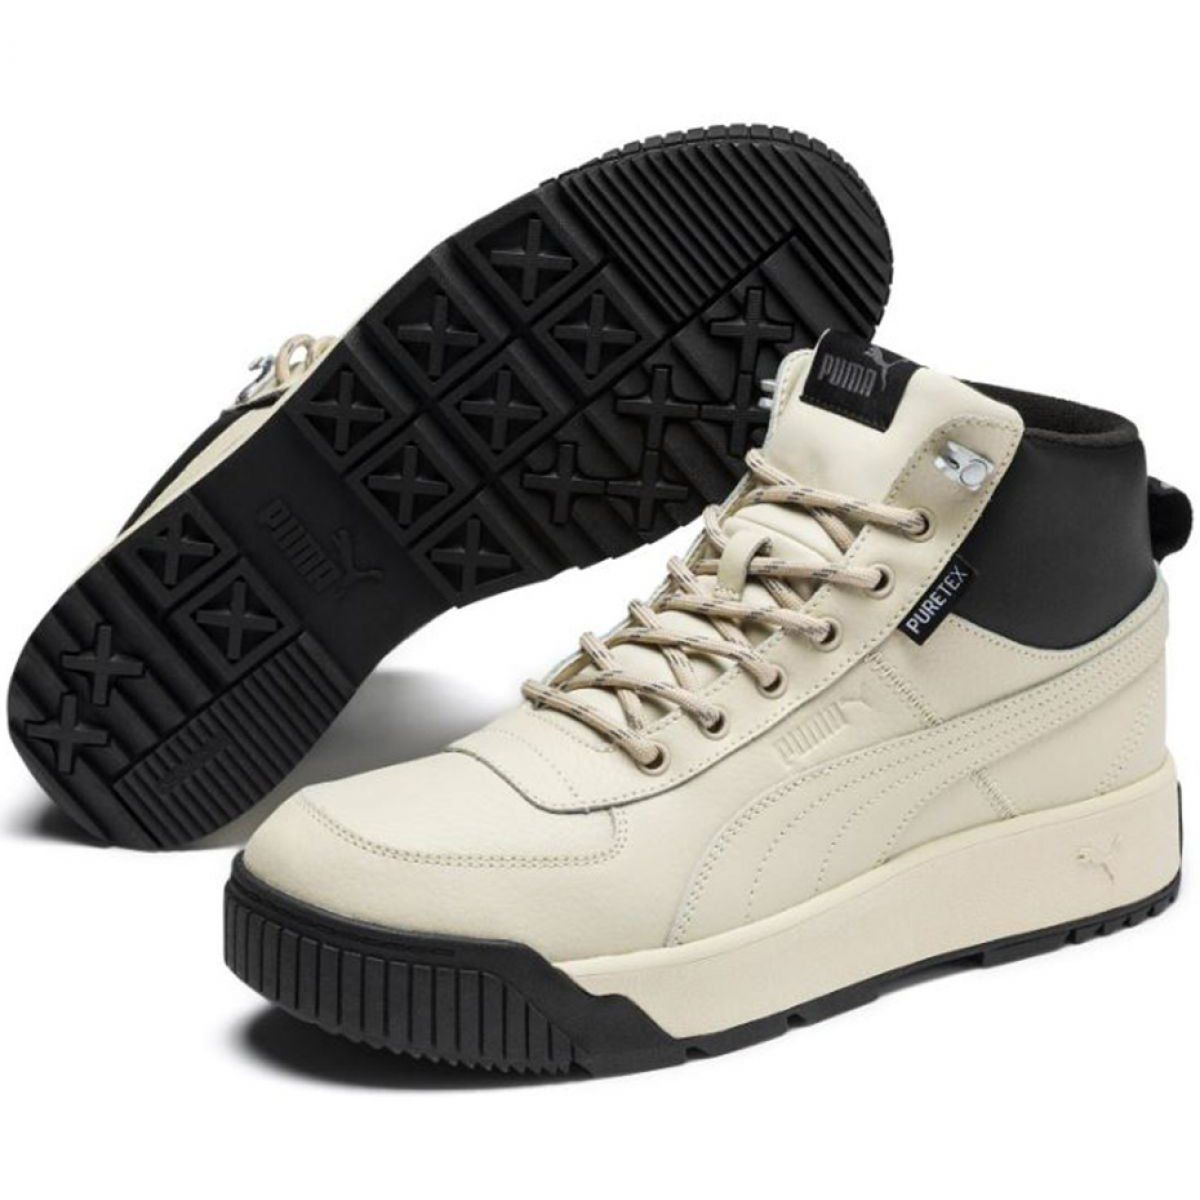 Buty Puma Tarrenz Sb Puretex M 370552 03 Bezowy Sport Shoes Men Mid Boots Puma Sneaker